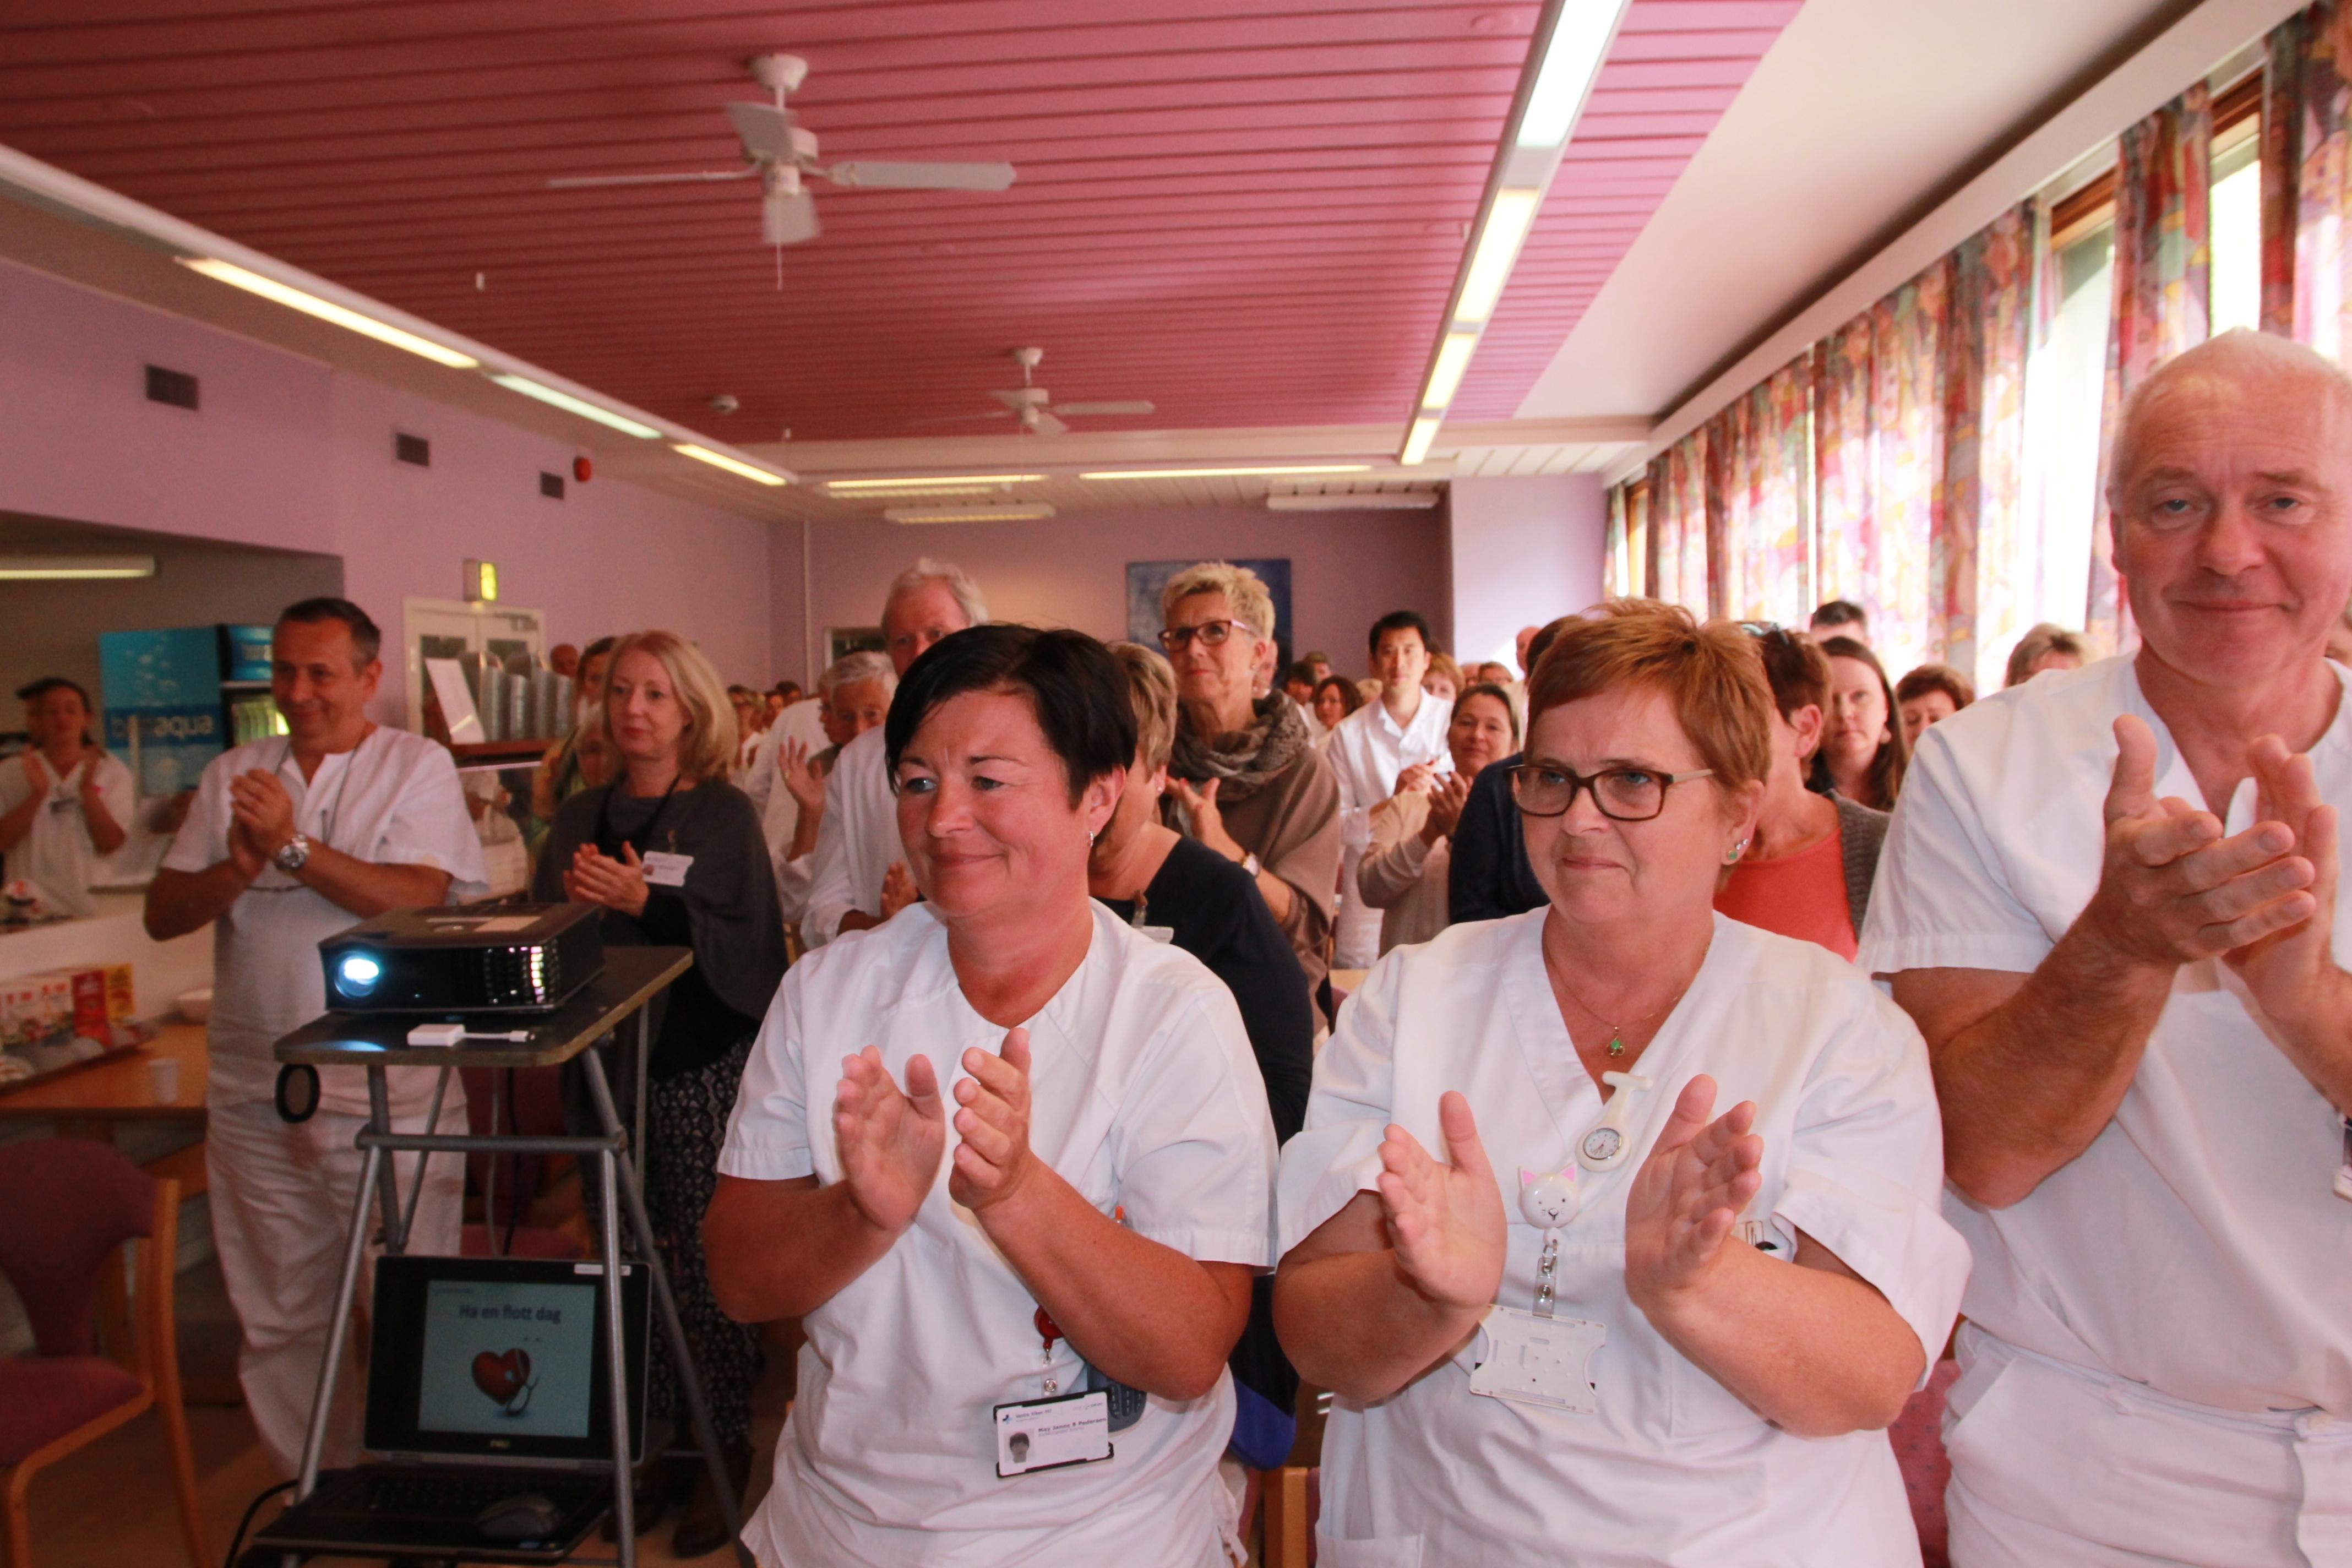 20160829 HR Norges Lederpris staaende applaus for Per Bleikelia 00004